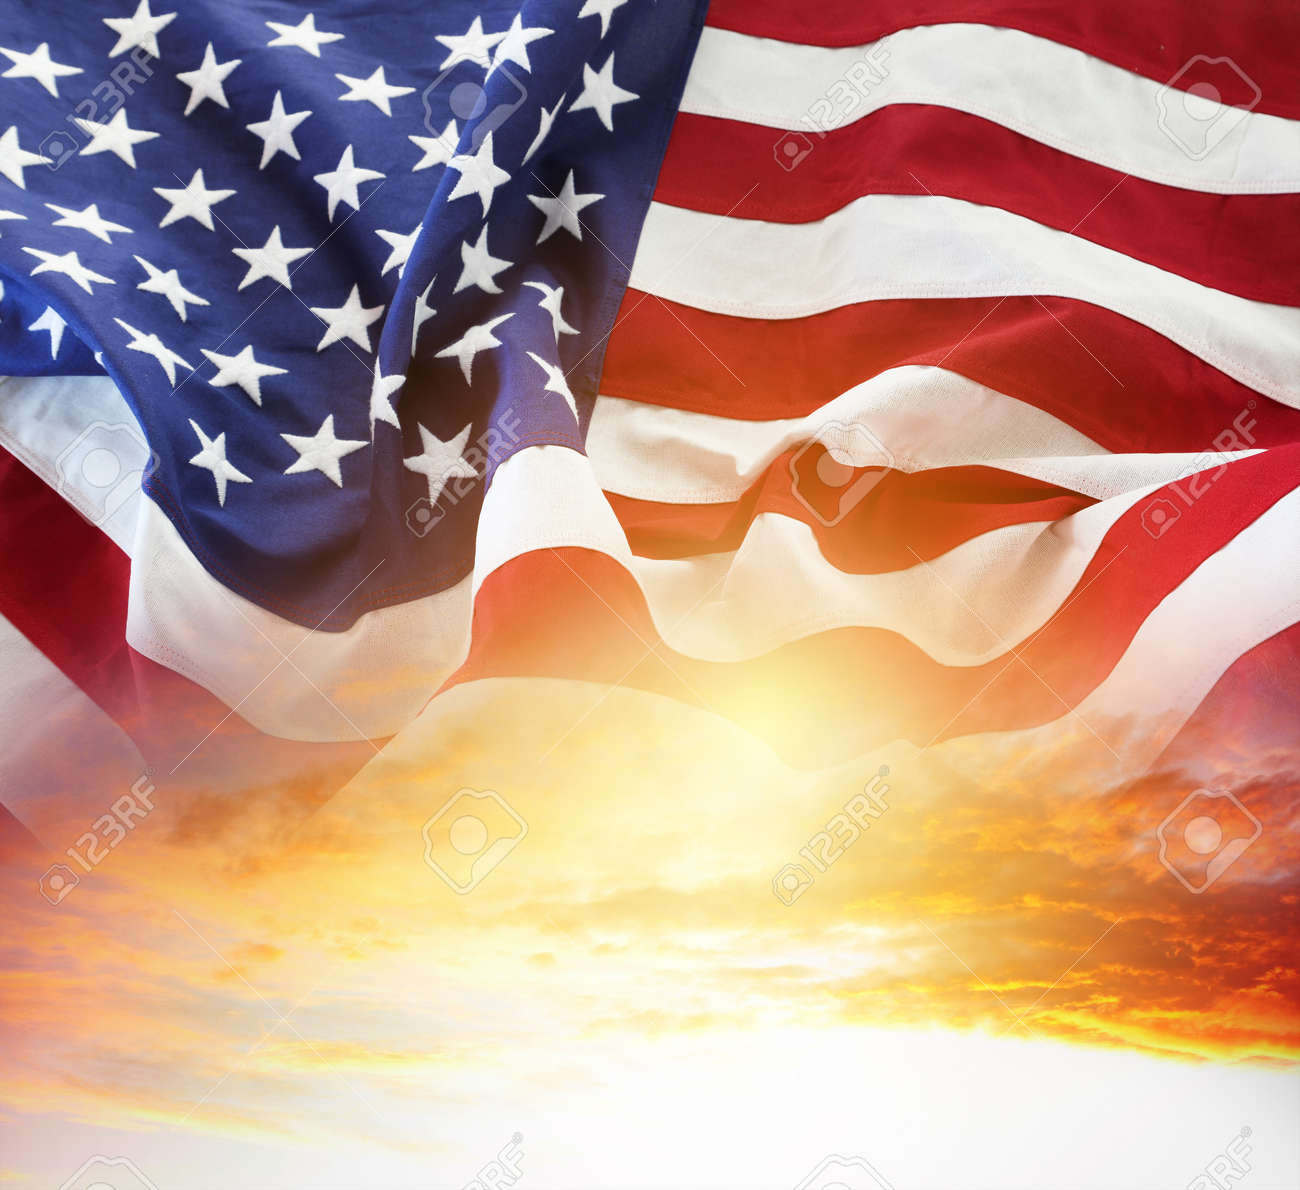 American flag in sunny sky - 166694366